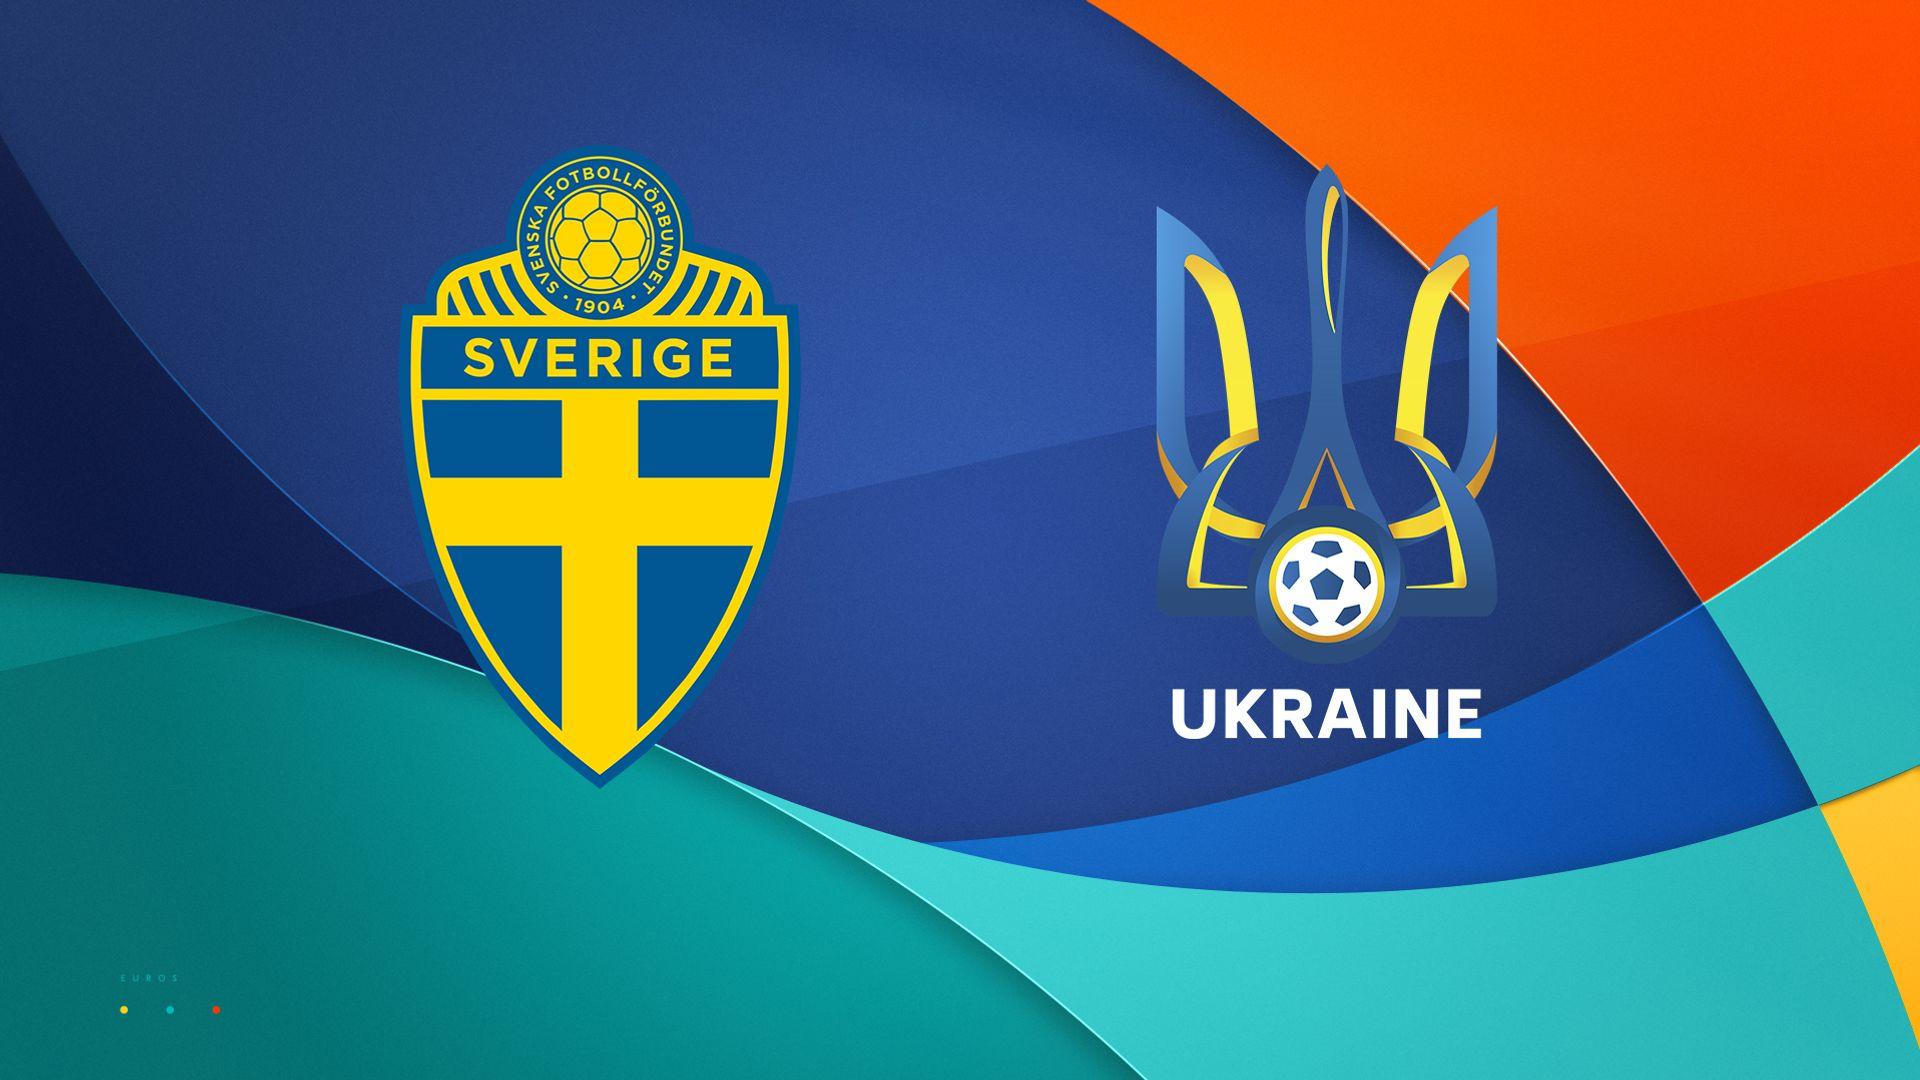 Stats companion: Sweden vs Ukraine